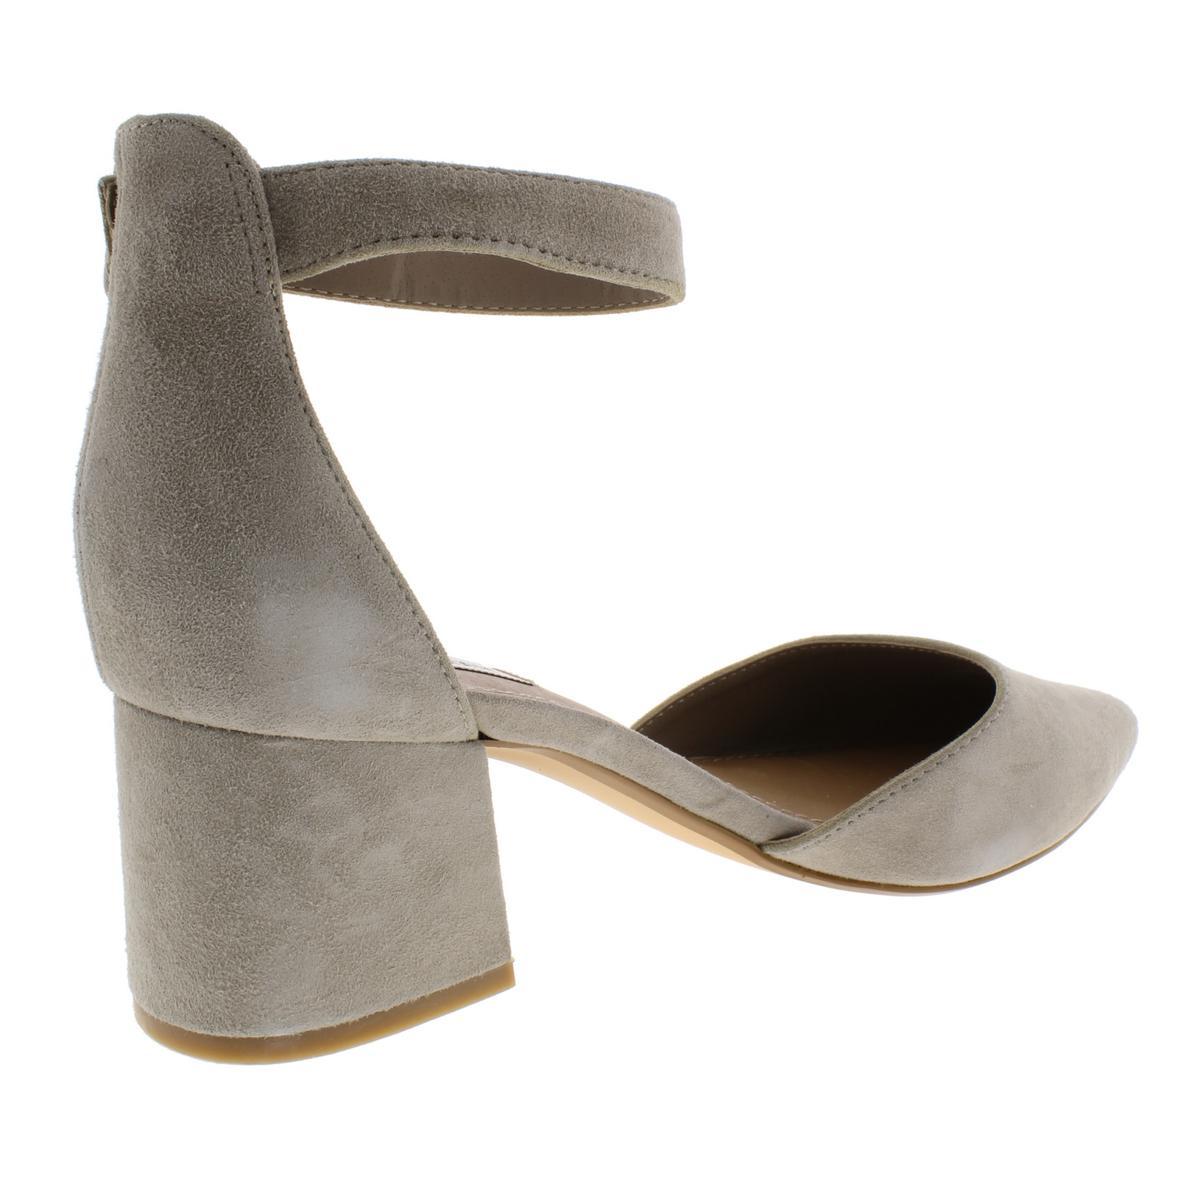 Steve Madden Womens Dainna Suede Almond Toe Pump D/'Orsay Heels Shoes BHFO 6691